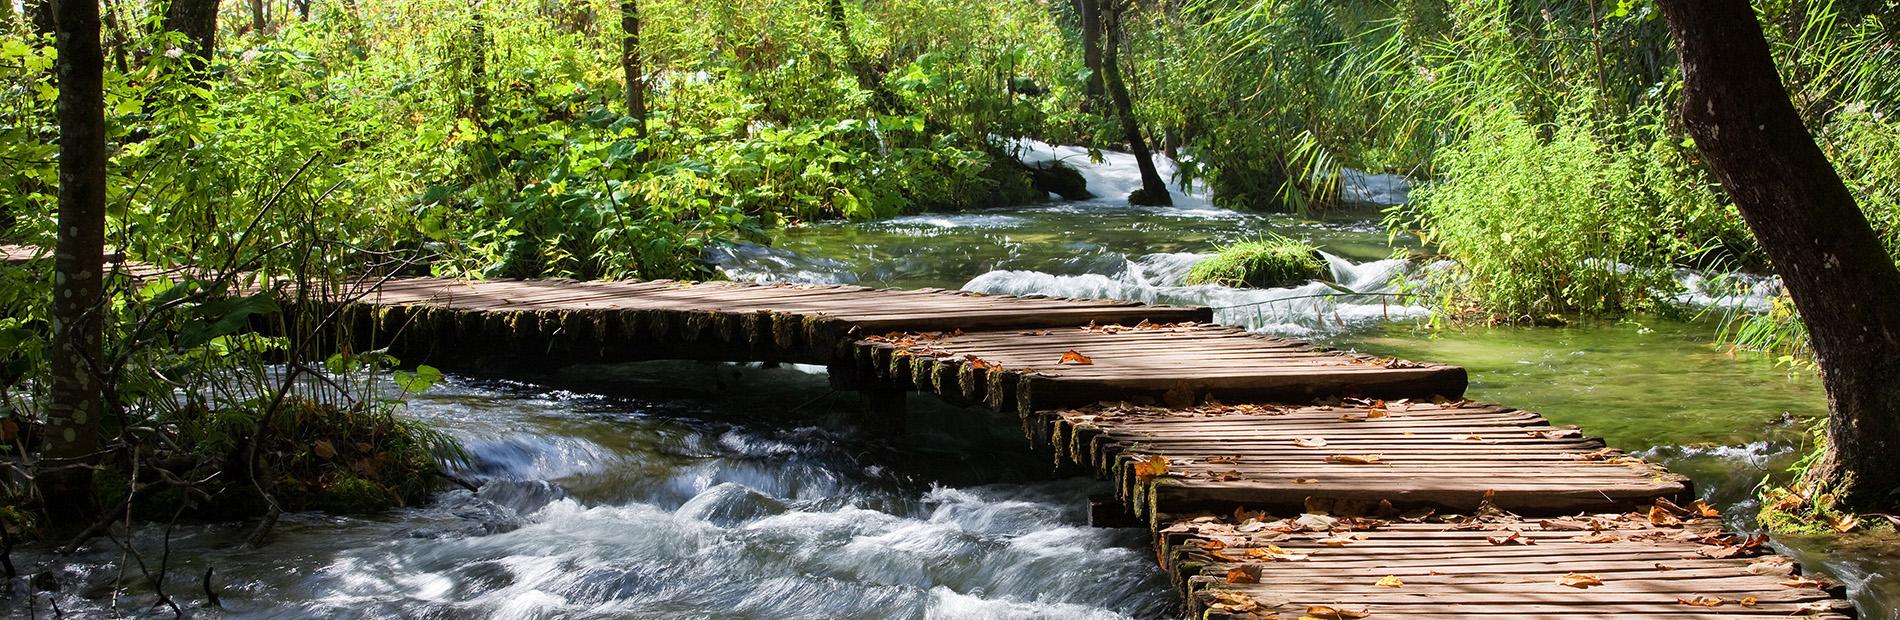 Brücke Bild